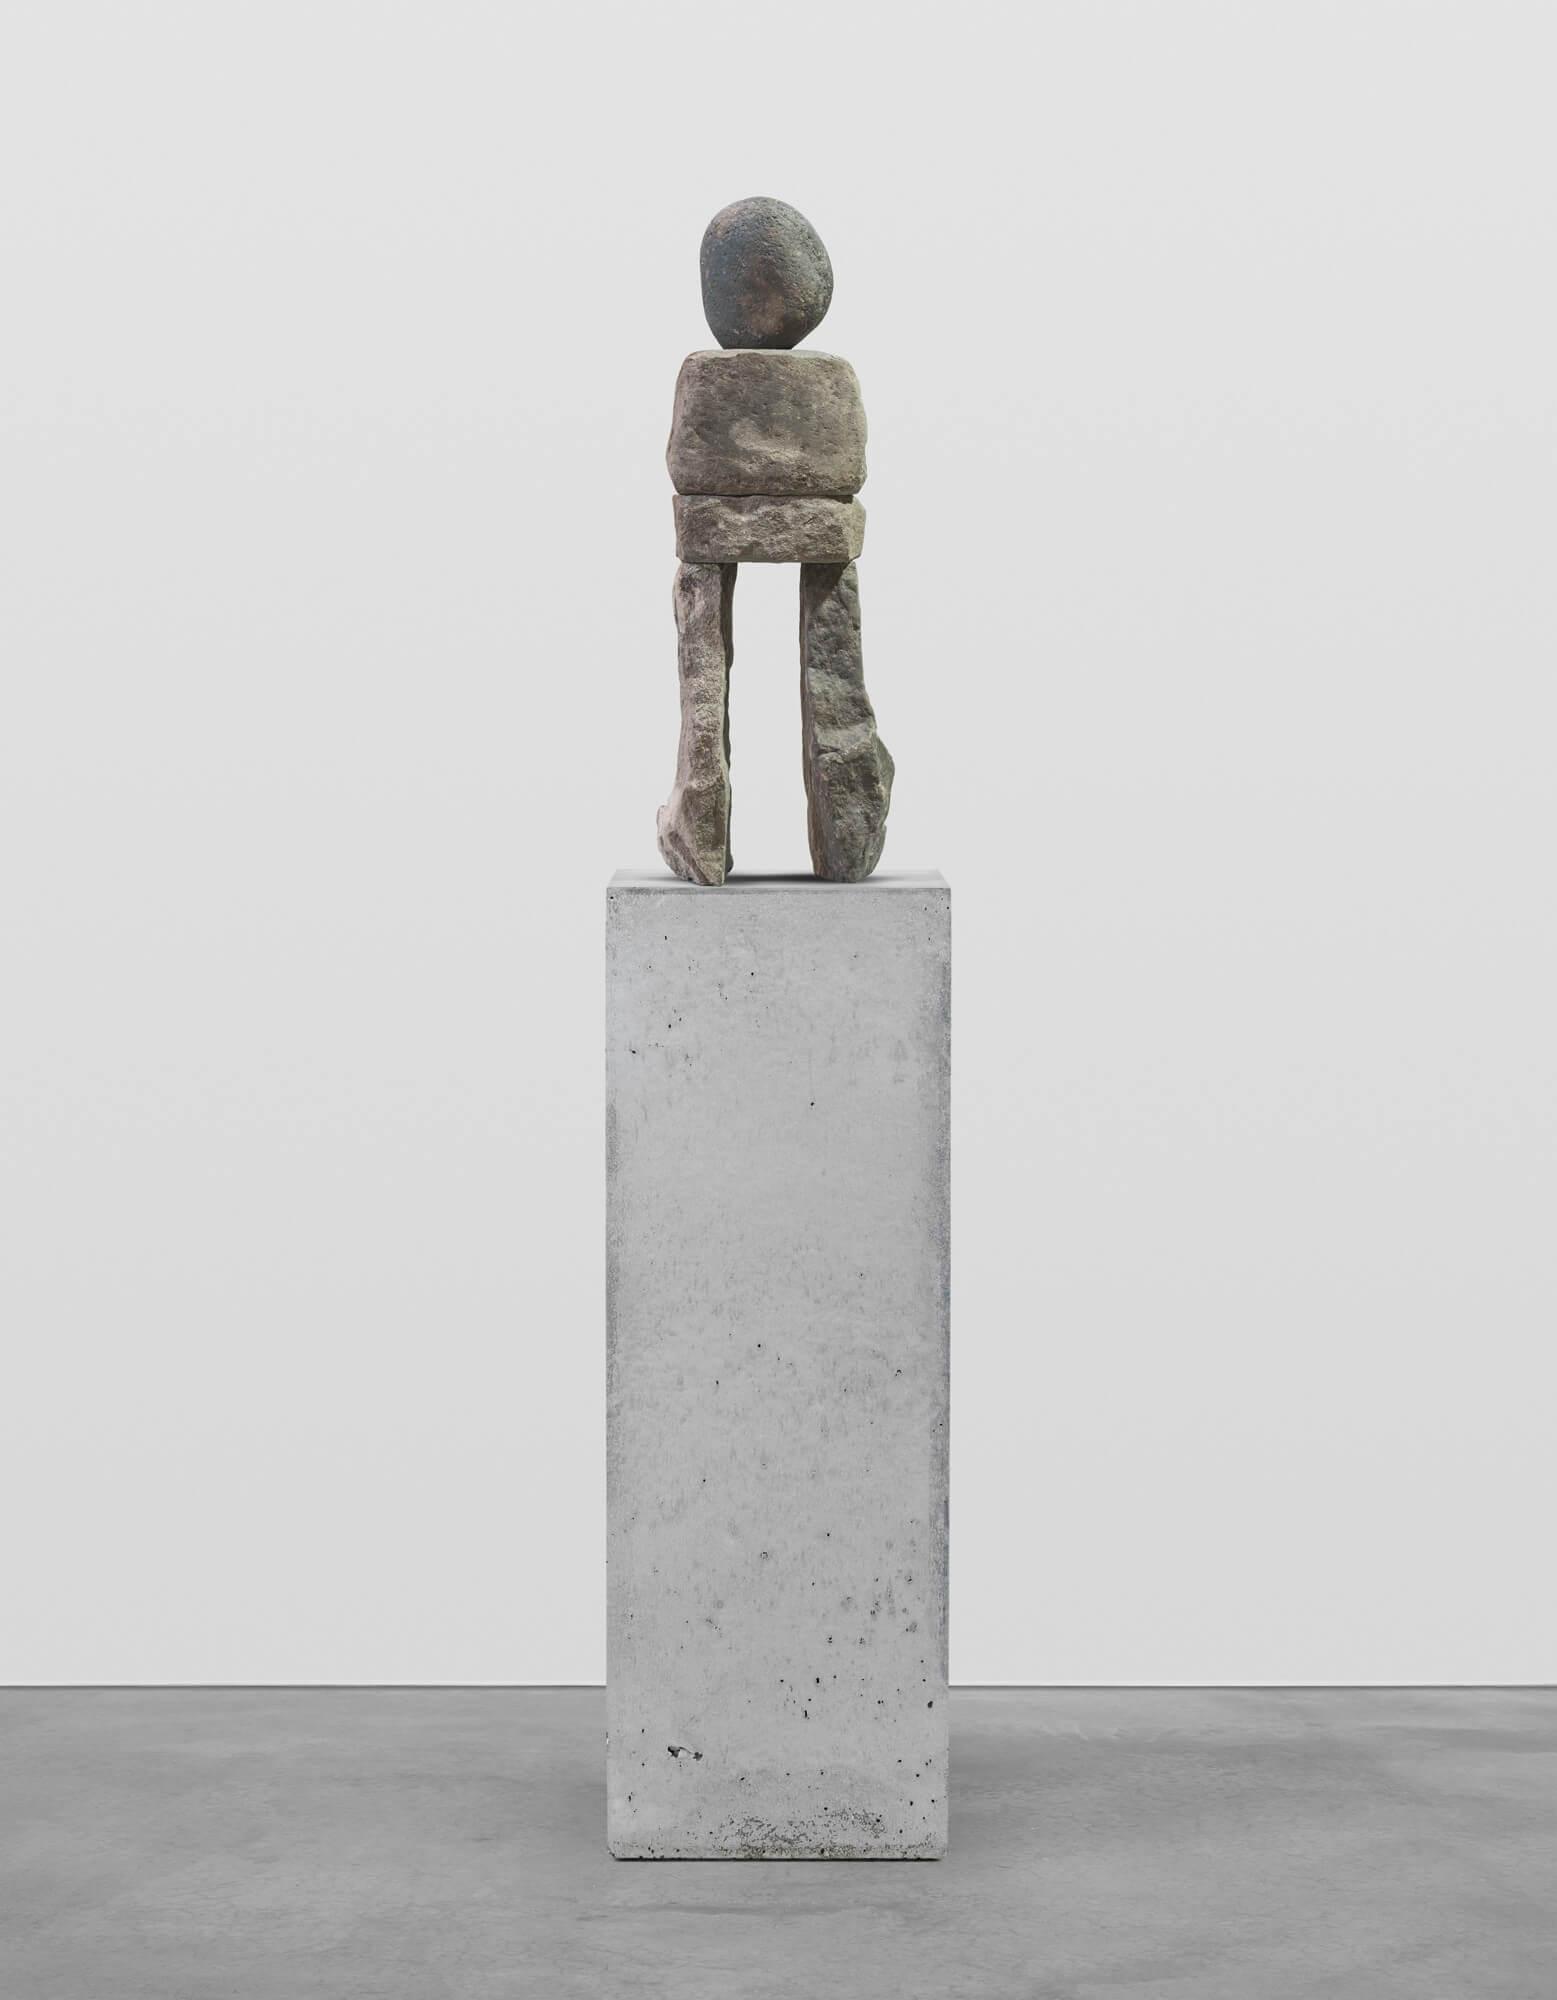 the contemplative | UGO RONDINONE